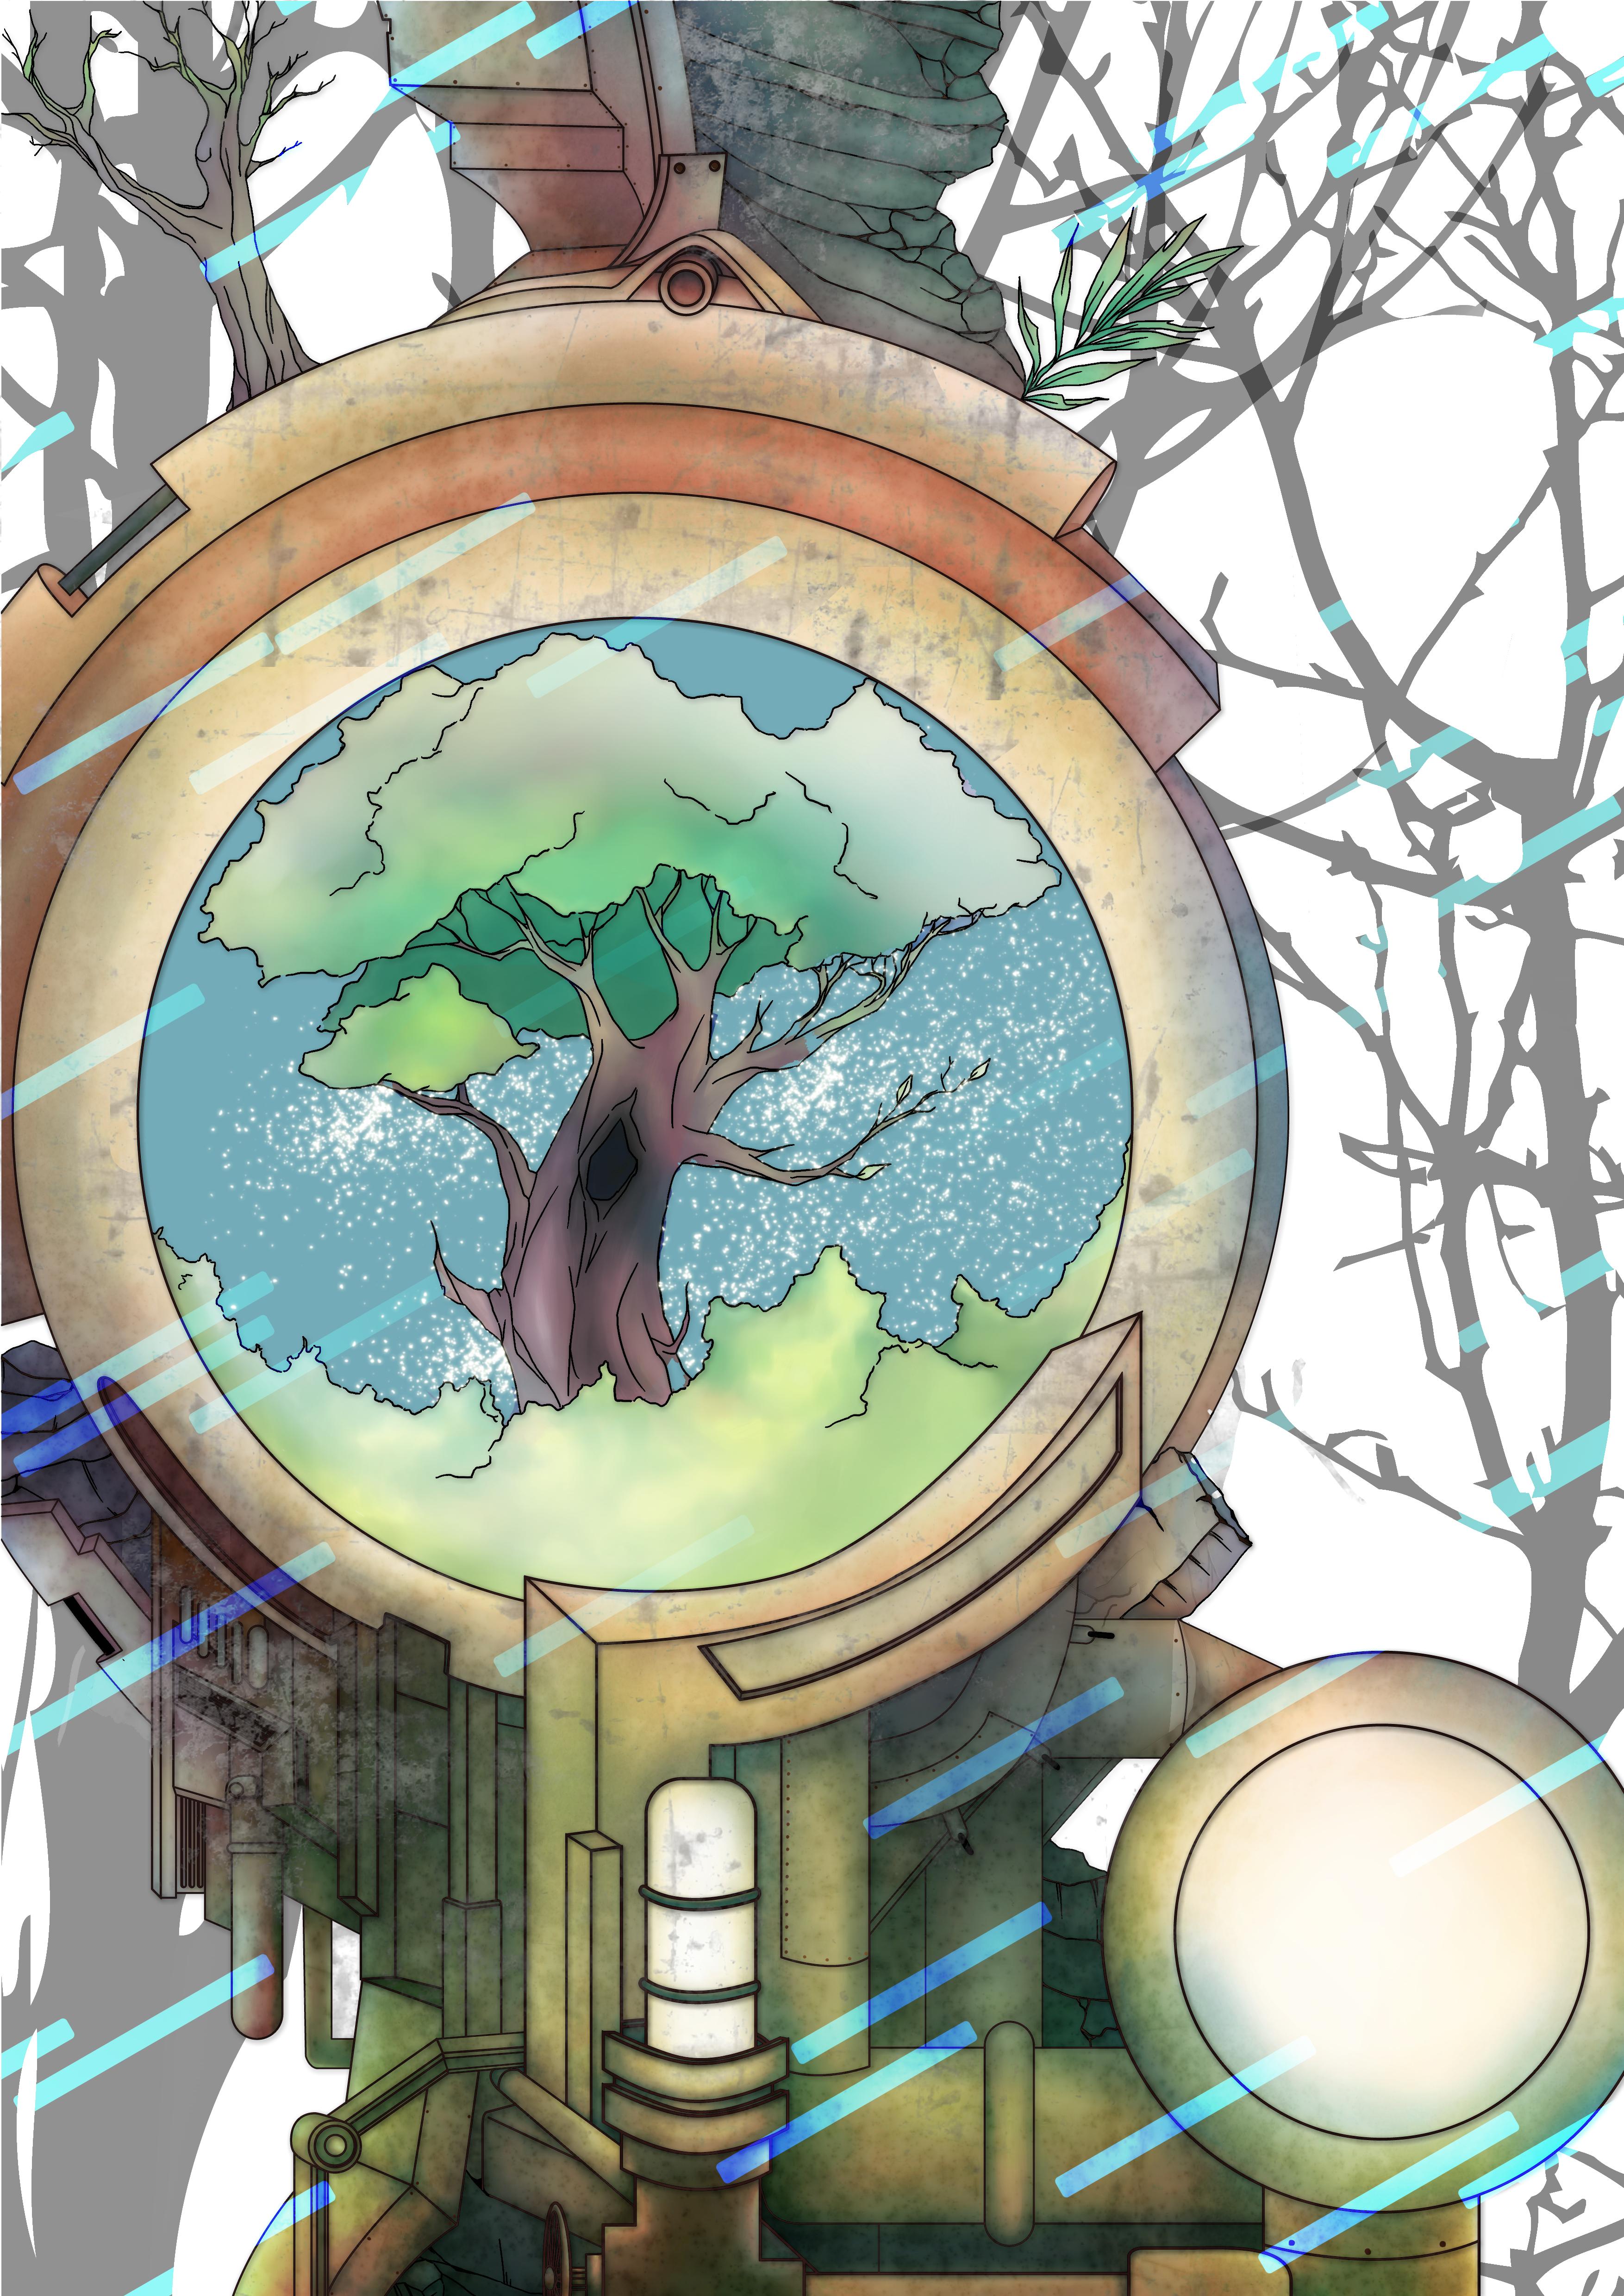 Terra Concept Art by Nisa Rieko Rinz